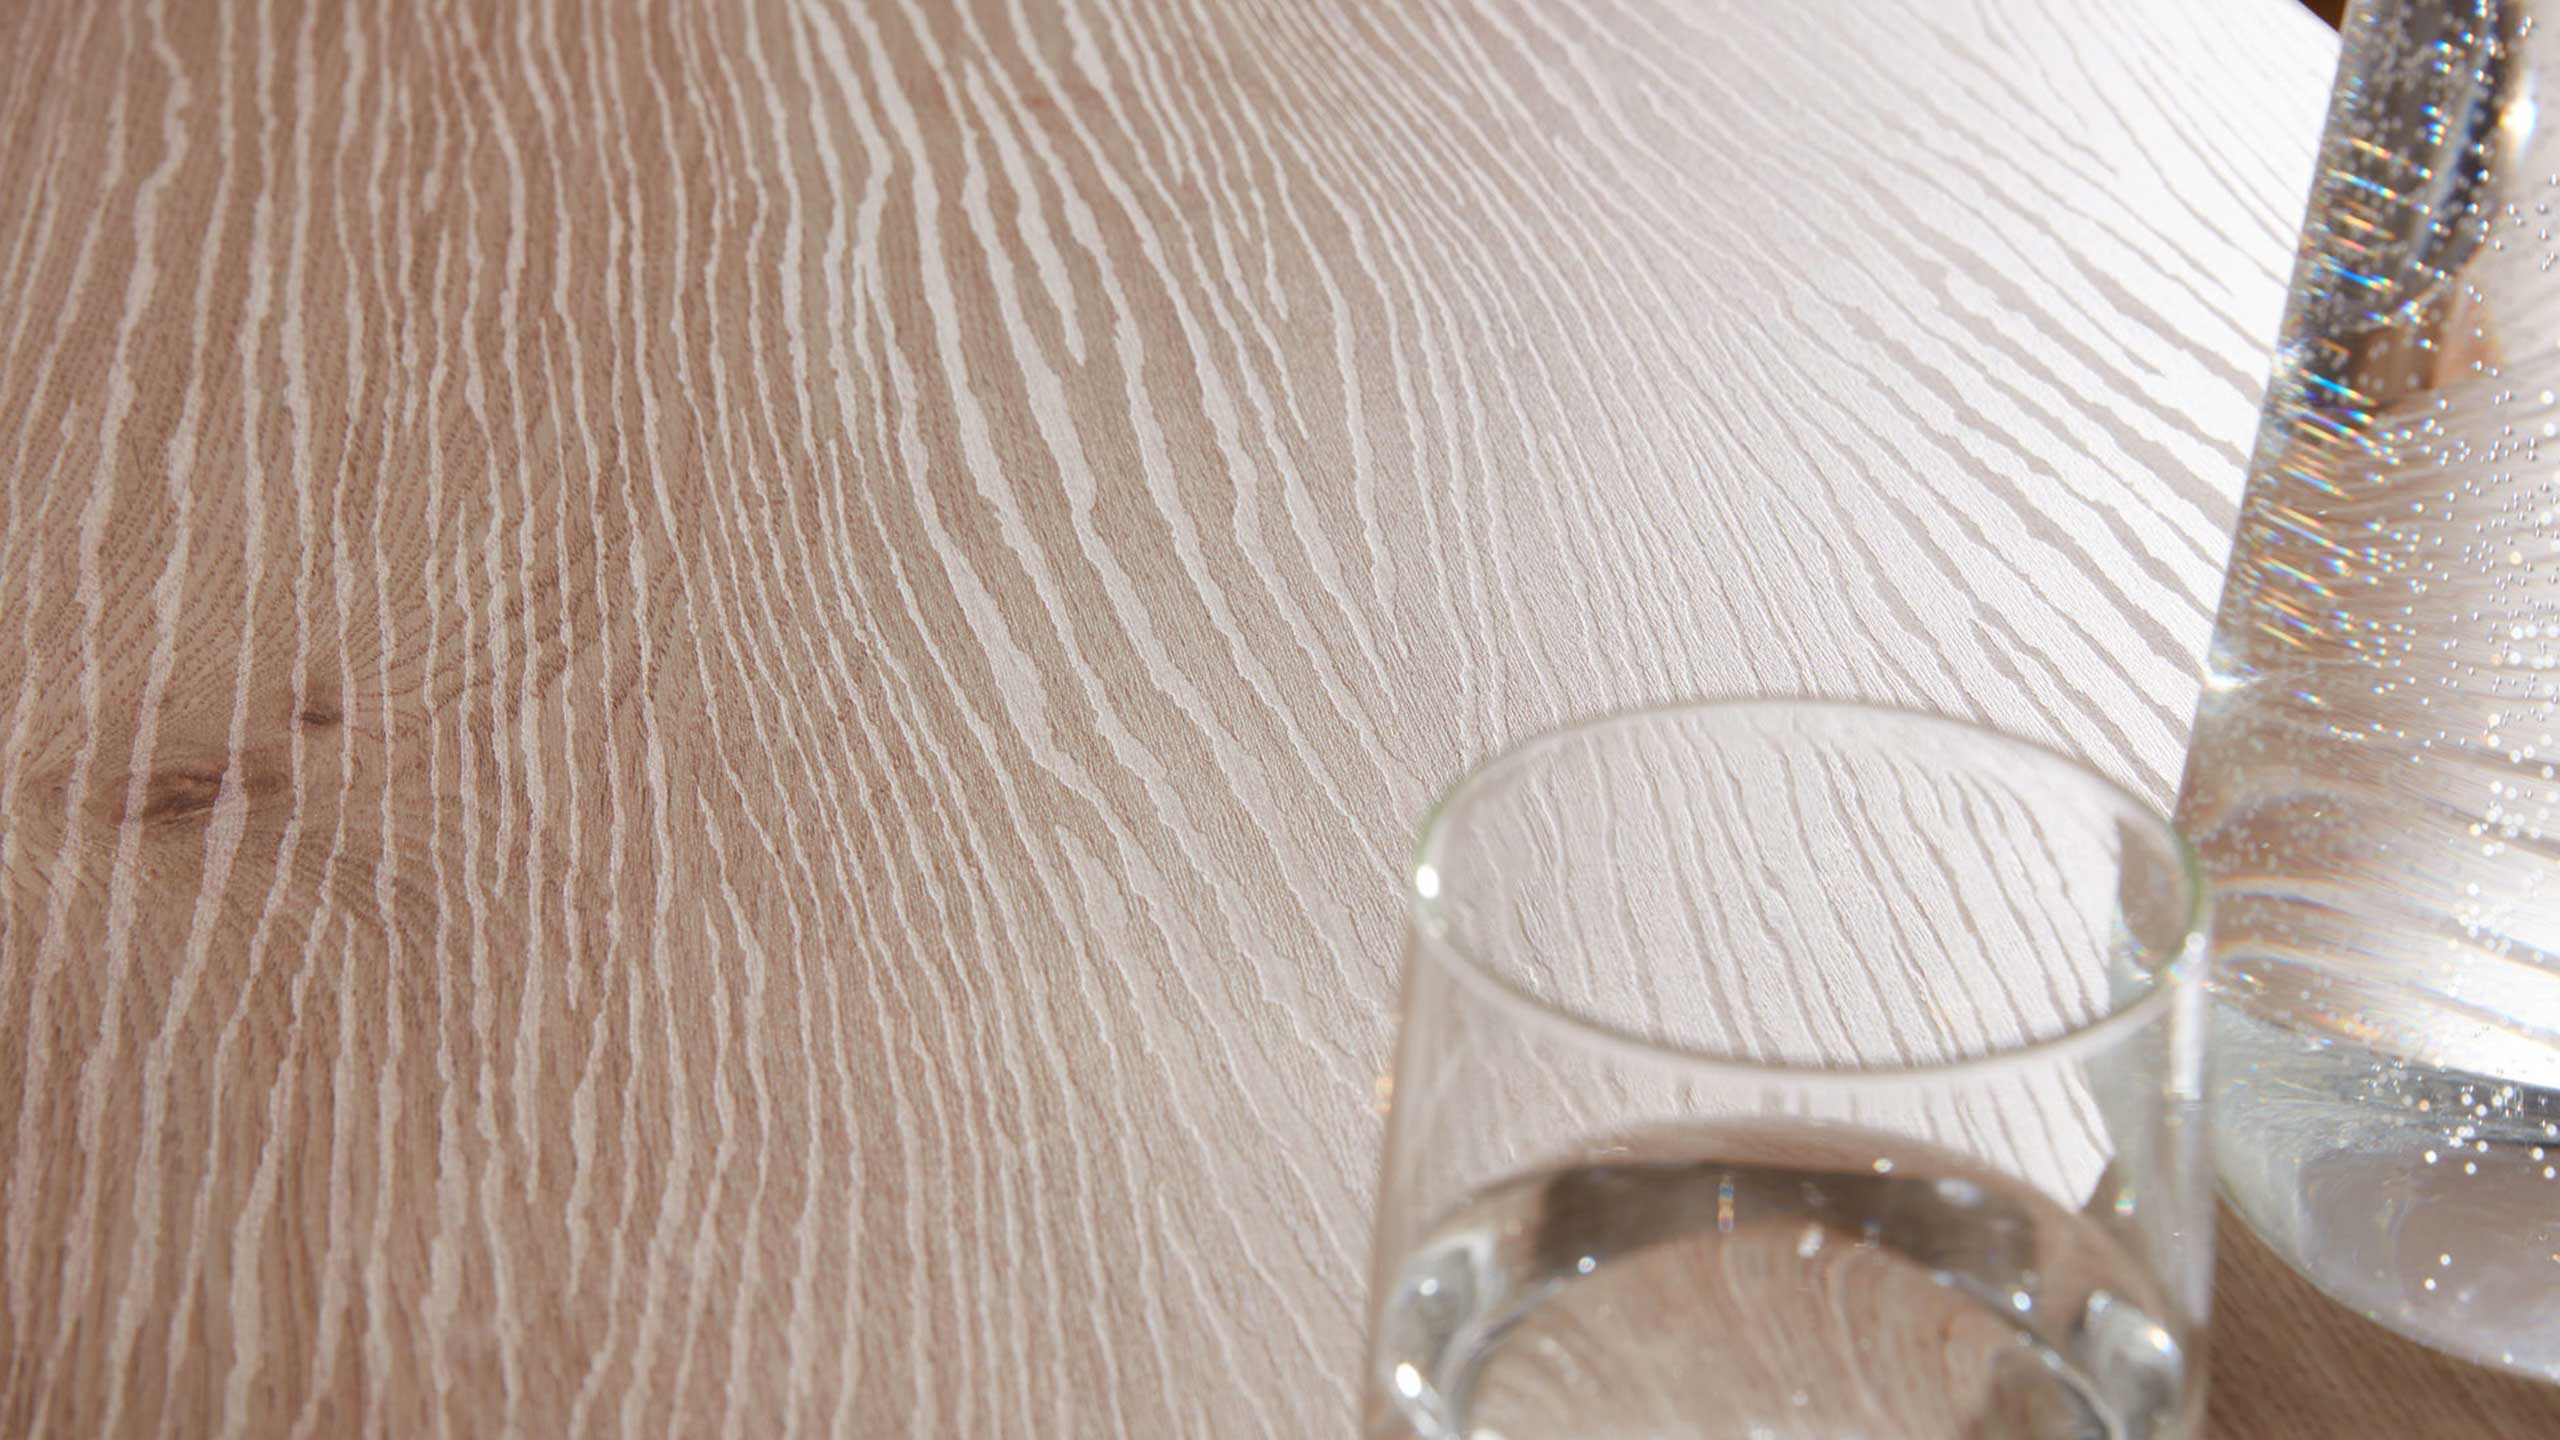 Kuechenarbeitsplatte aus Holz